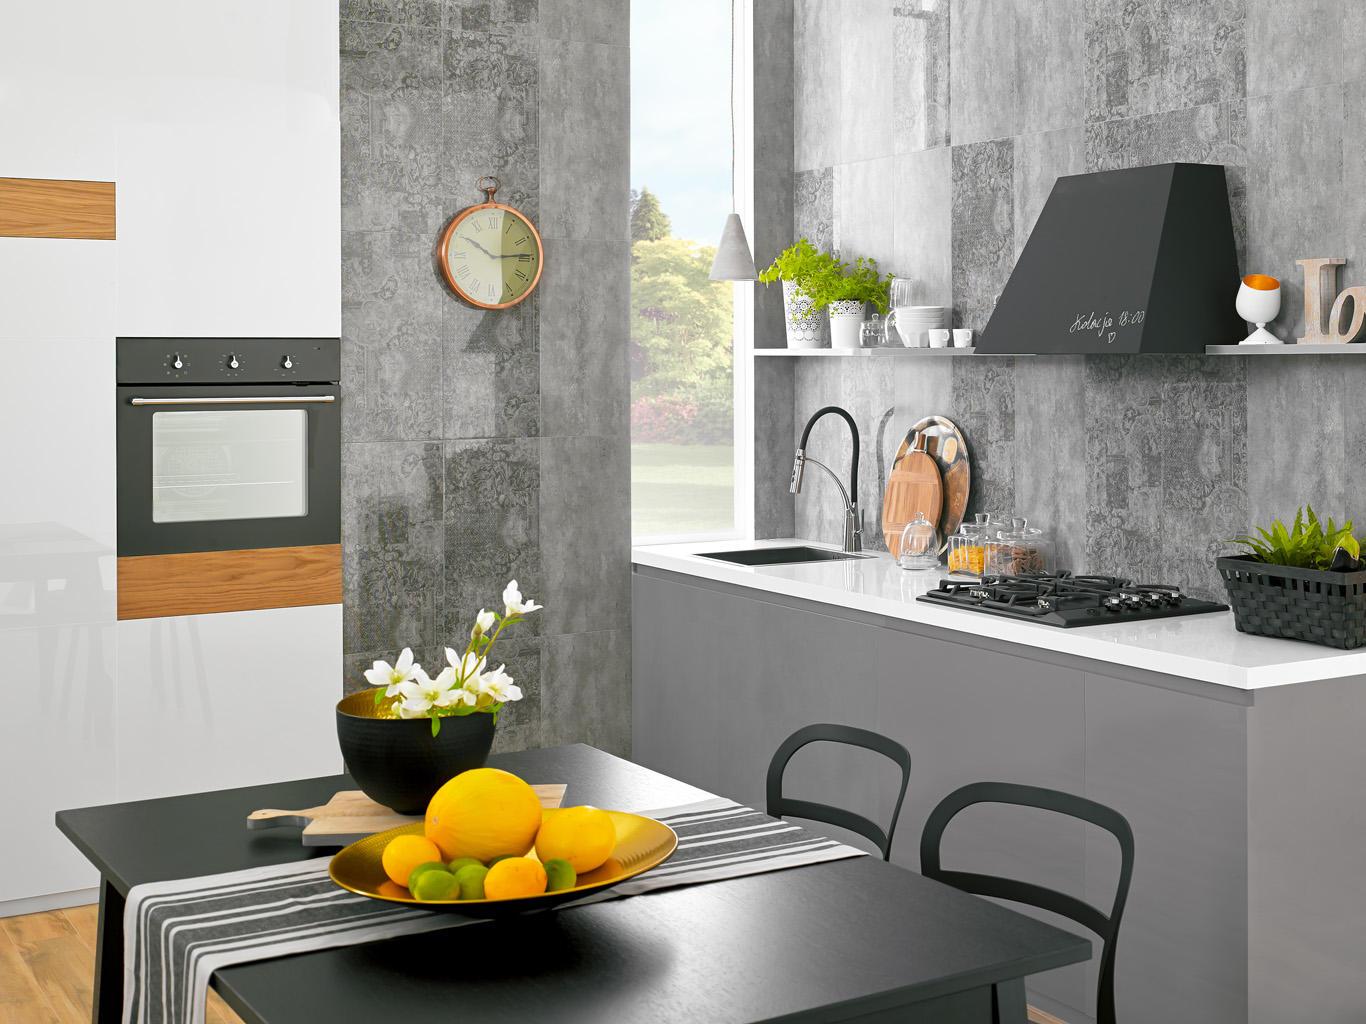 Siła prostoty z natury do kuchni